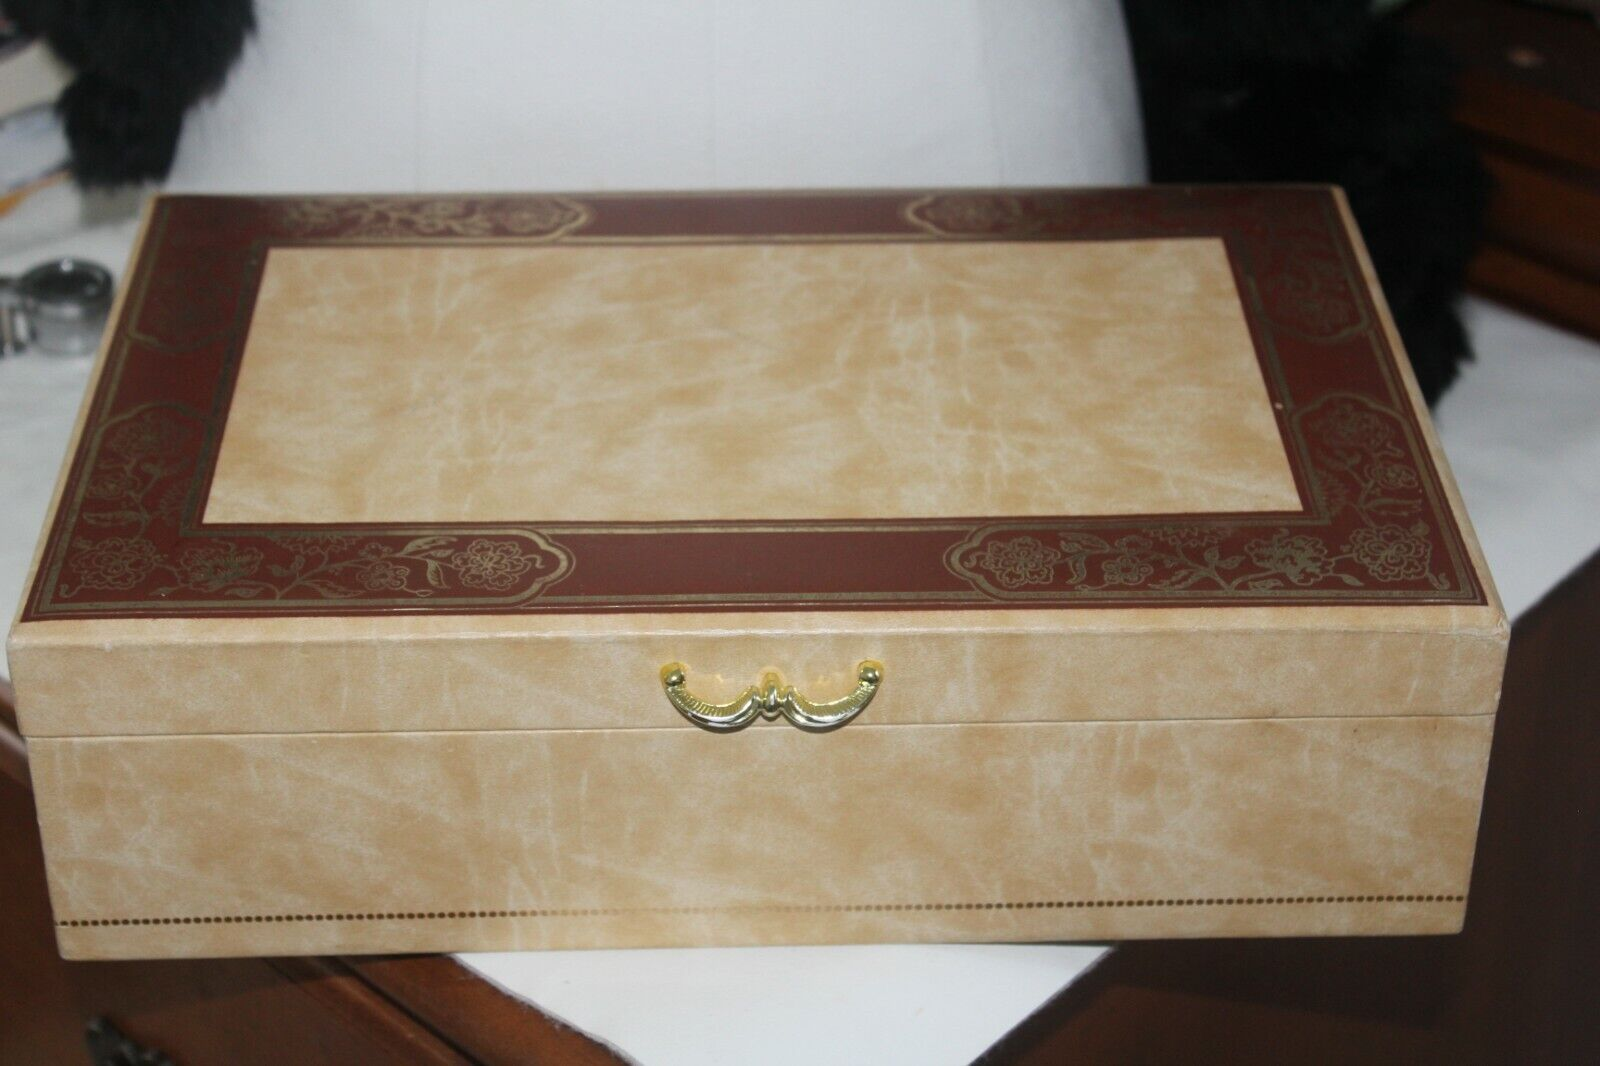 Estate Vintage Retro Mele Jewelry Organizer Box - $17.99